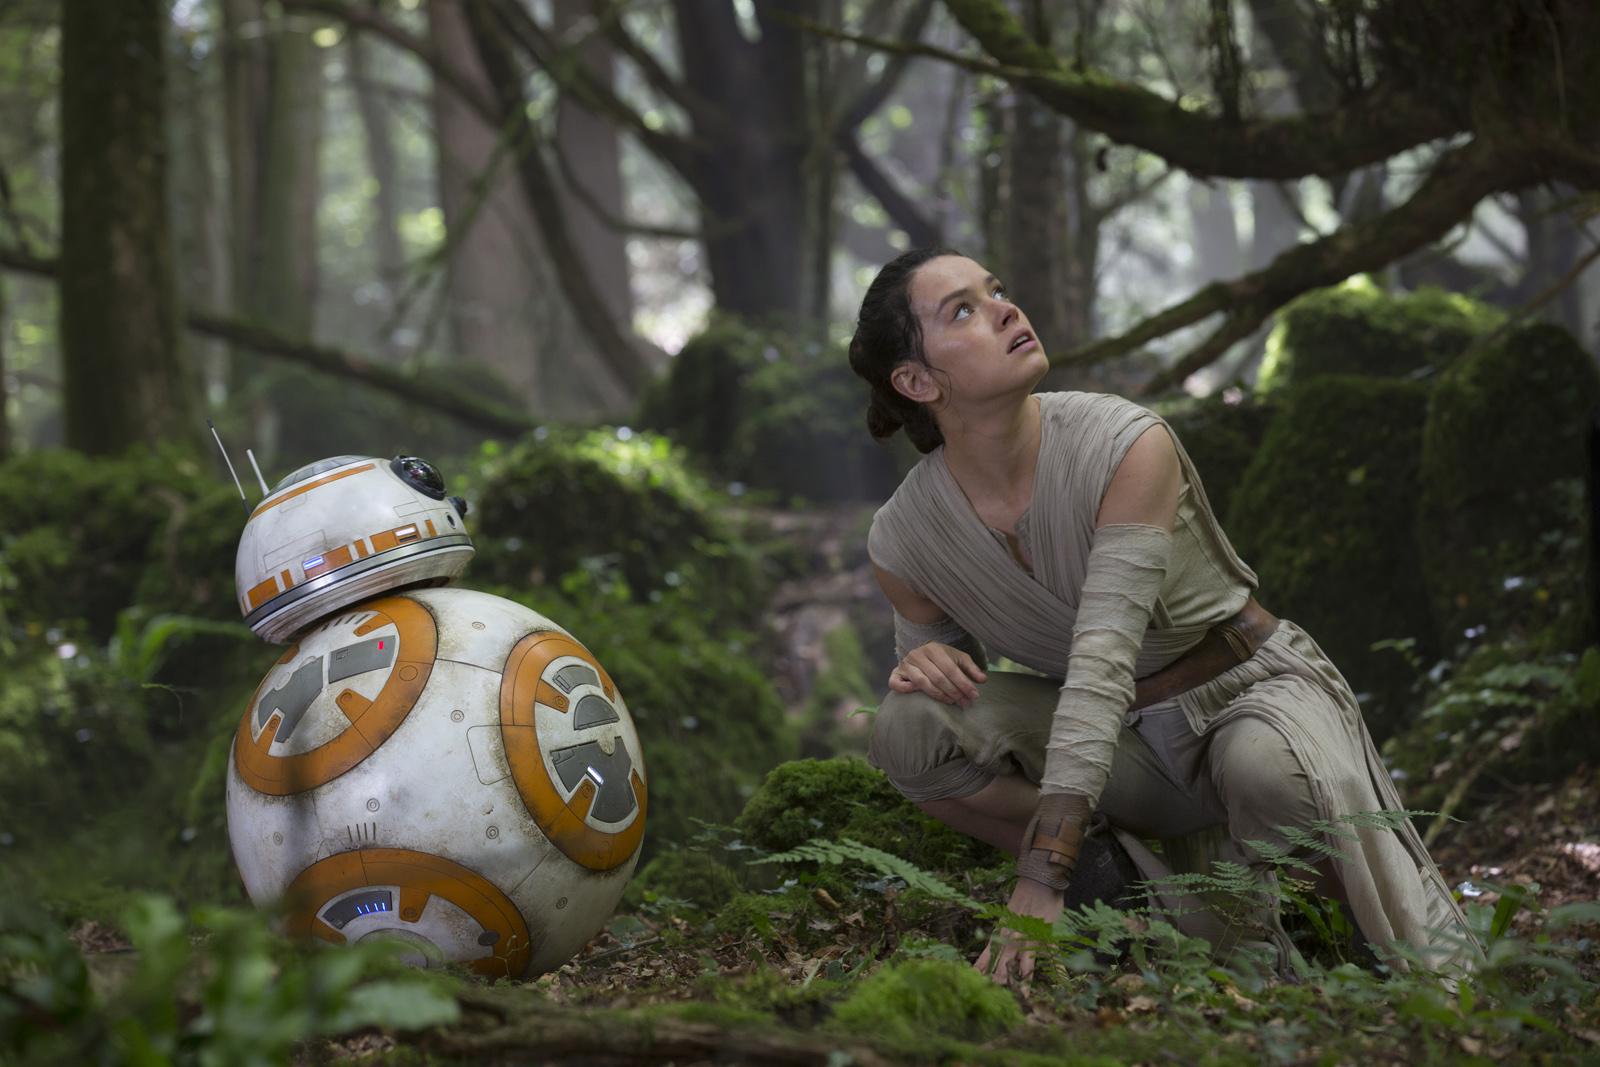 On connaît la date de sortie de Star Wars : Episode IX